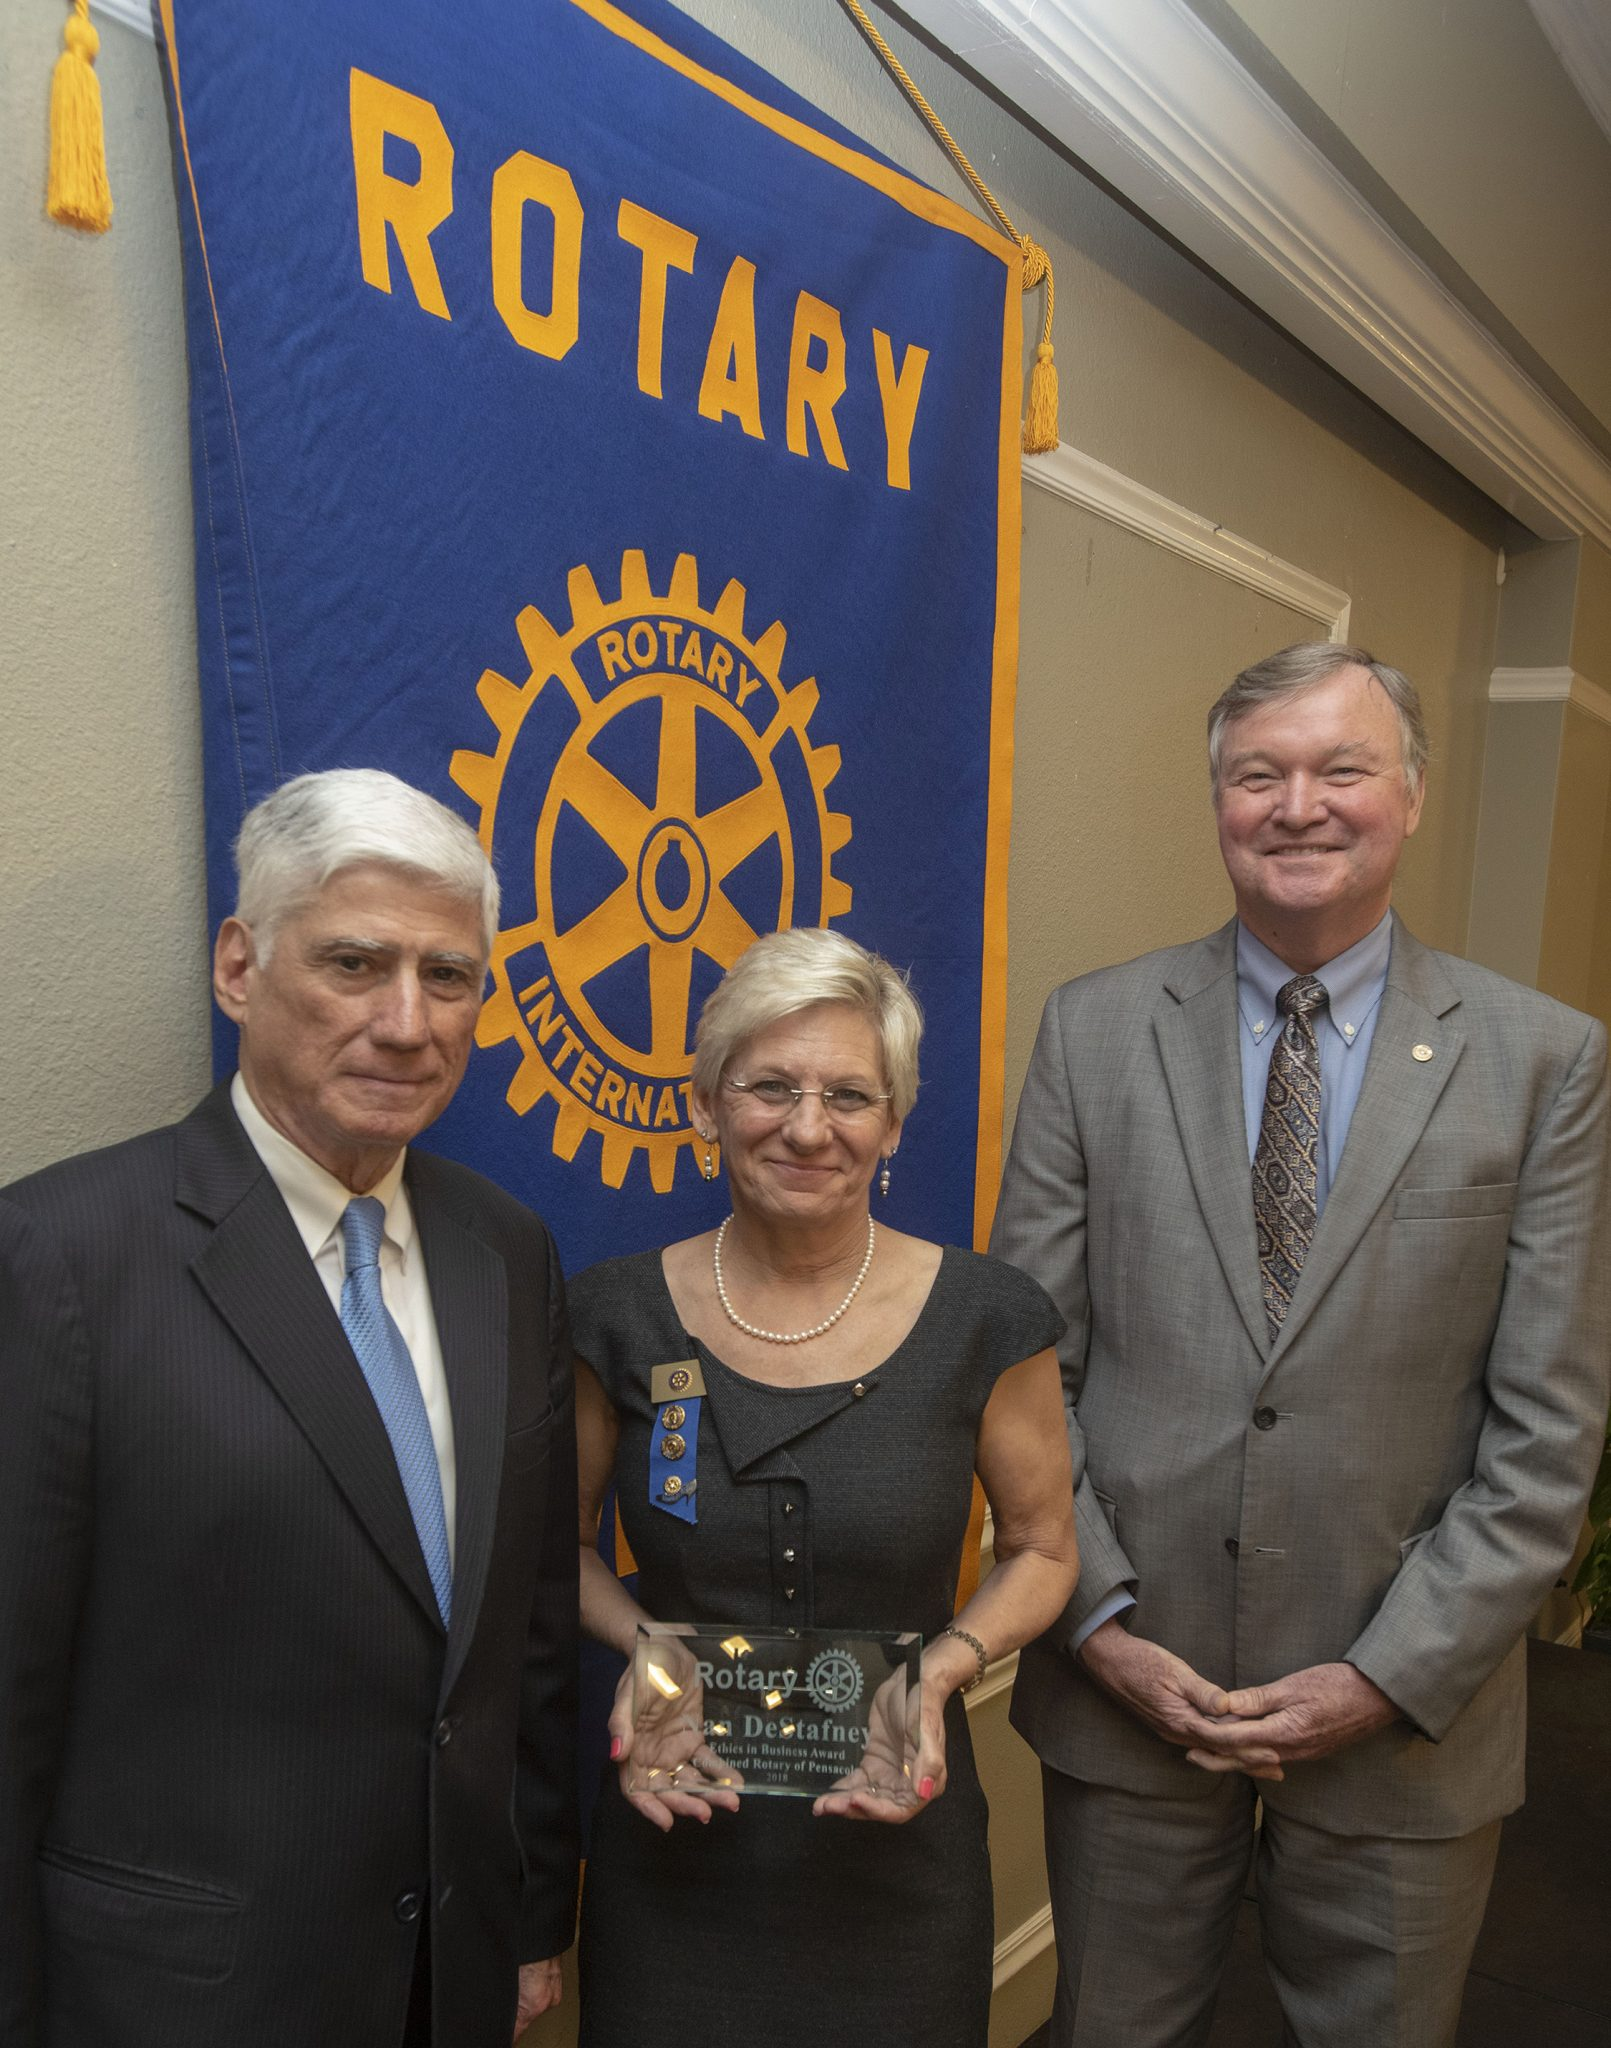 Nan DeStafney, 2018 winner of the Rotary Ethics in Business Award, with Dr. Ed Ranelli and Ted Kirchharr.